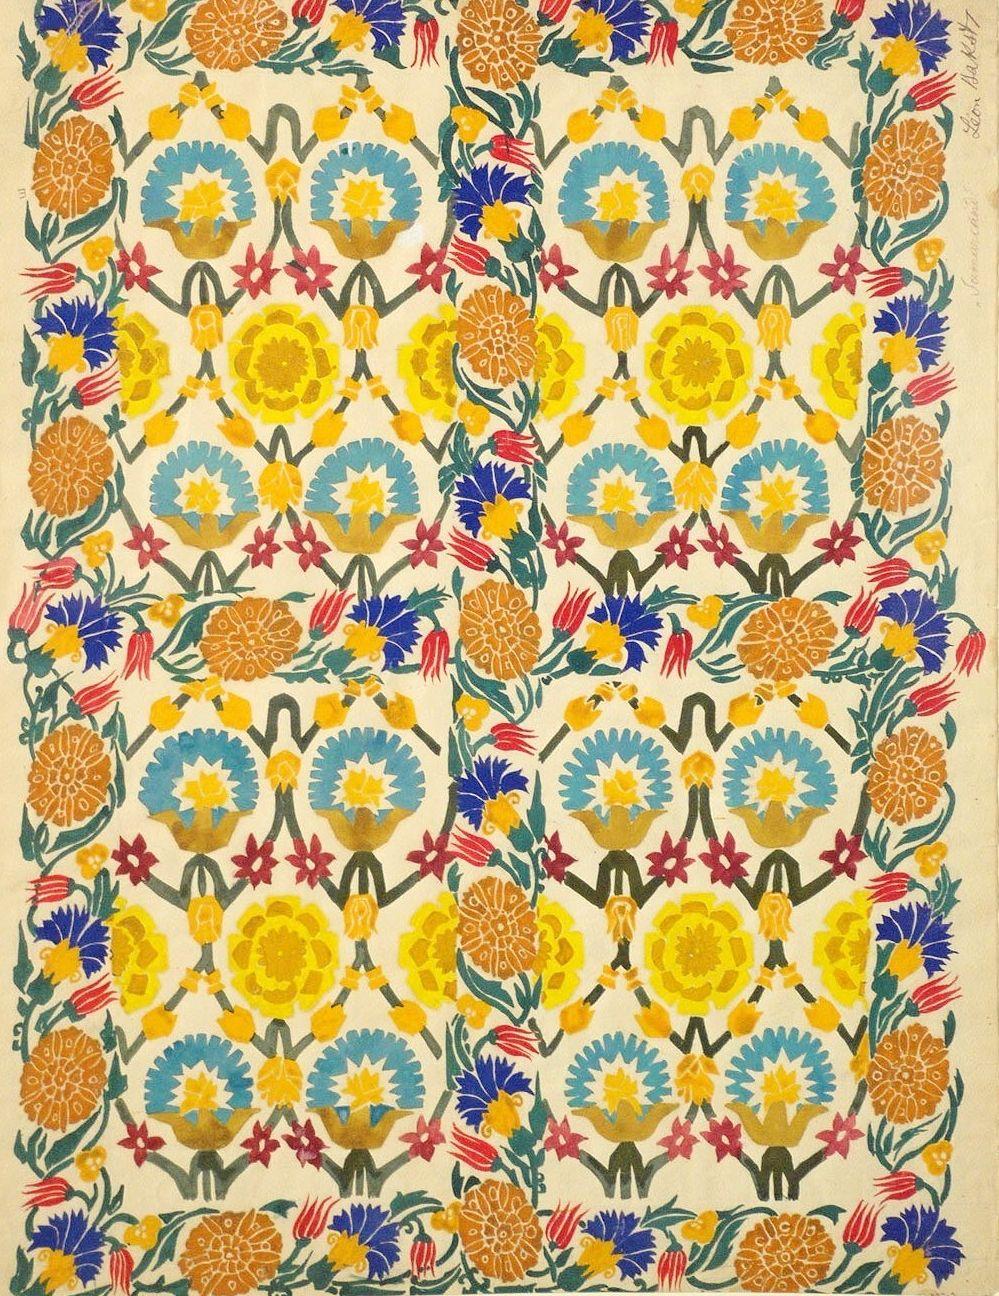 Textile_print_by_Leon_Bakst_05.jpg (999×1296)